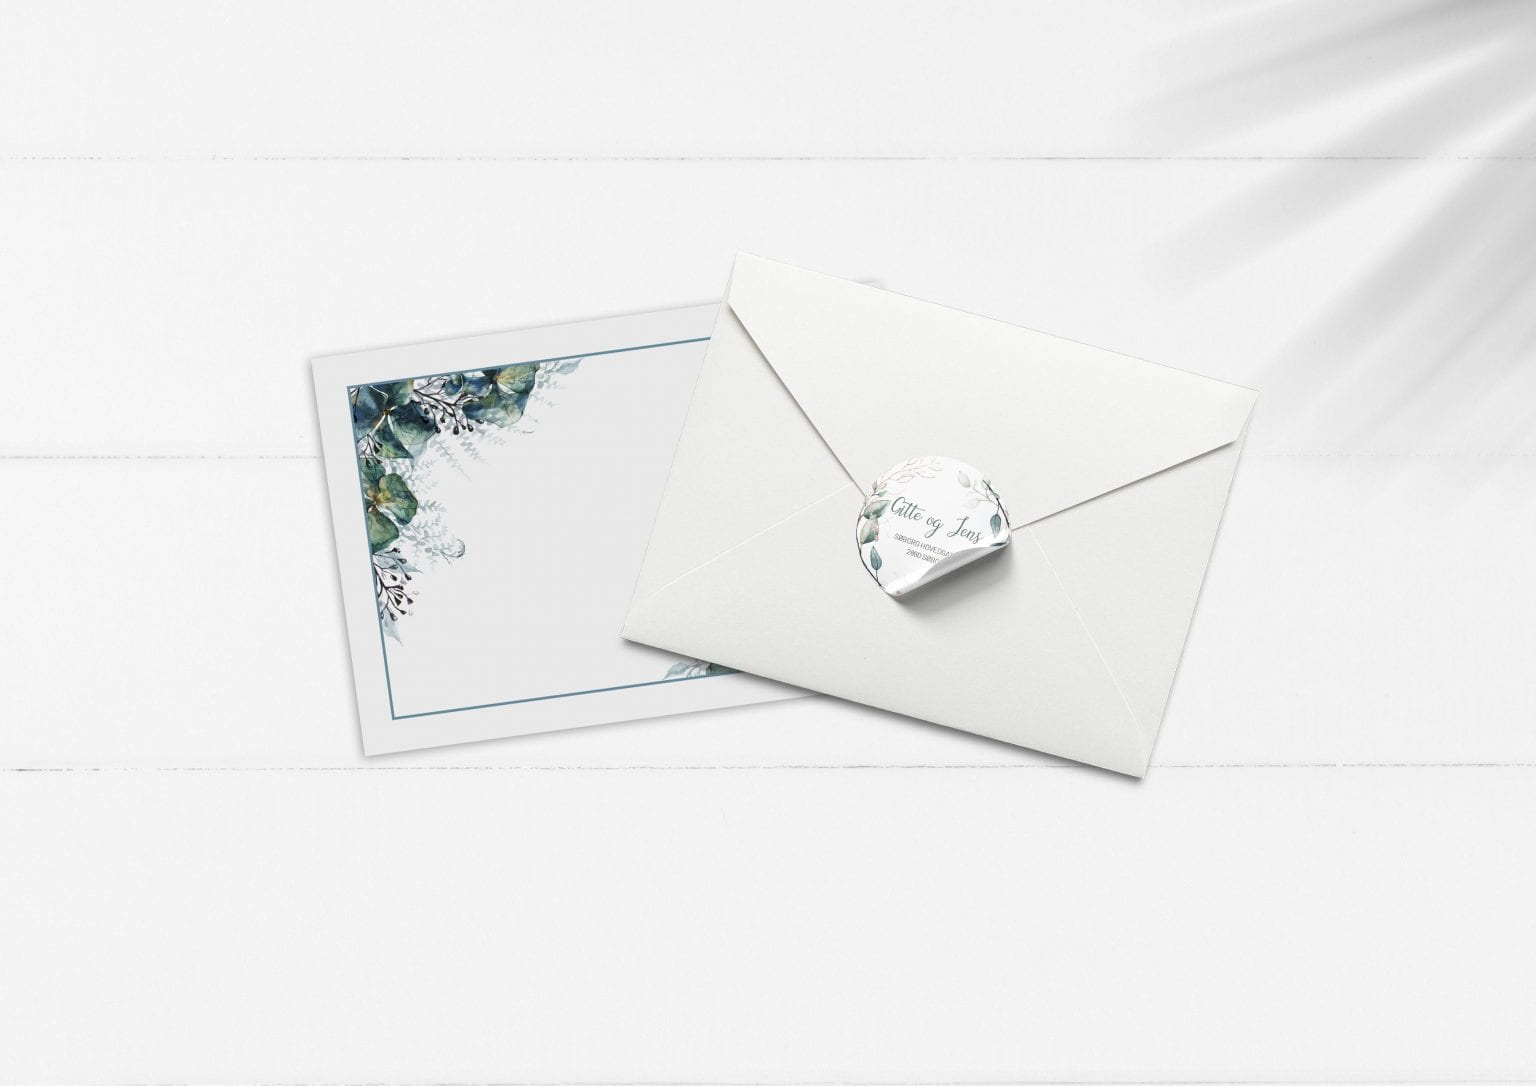 Teal Vibrant, kuvert og stickers, bryllup